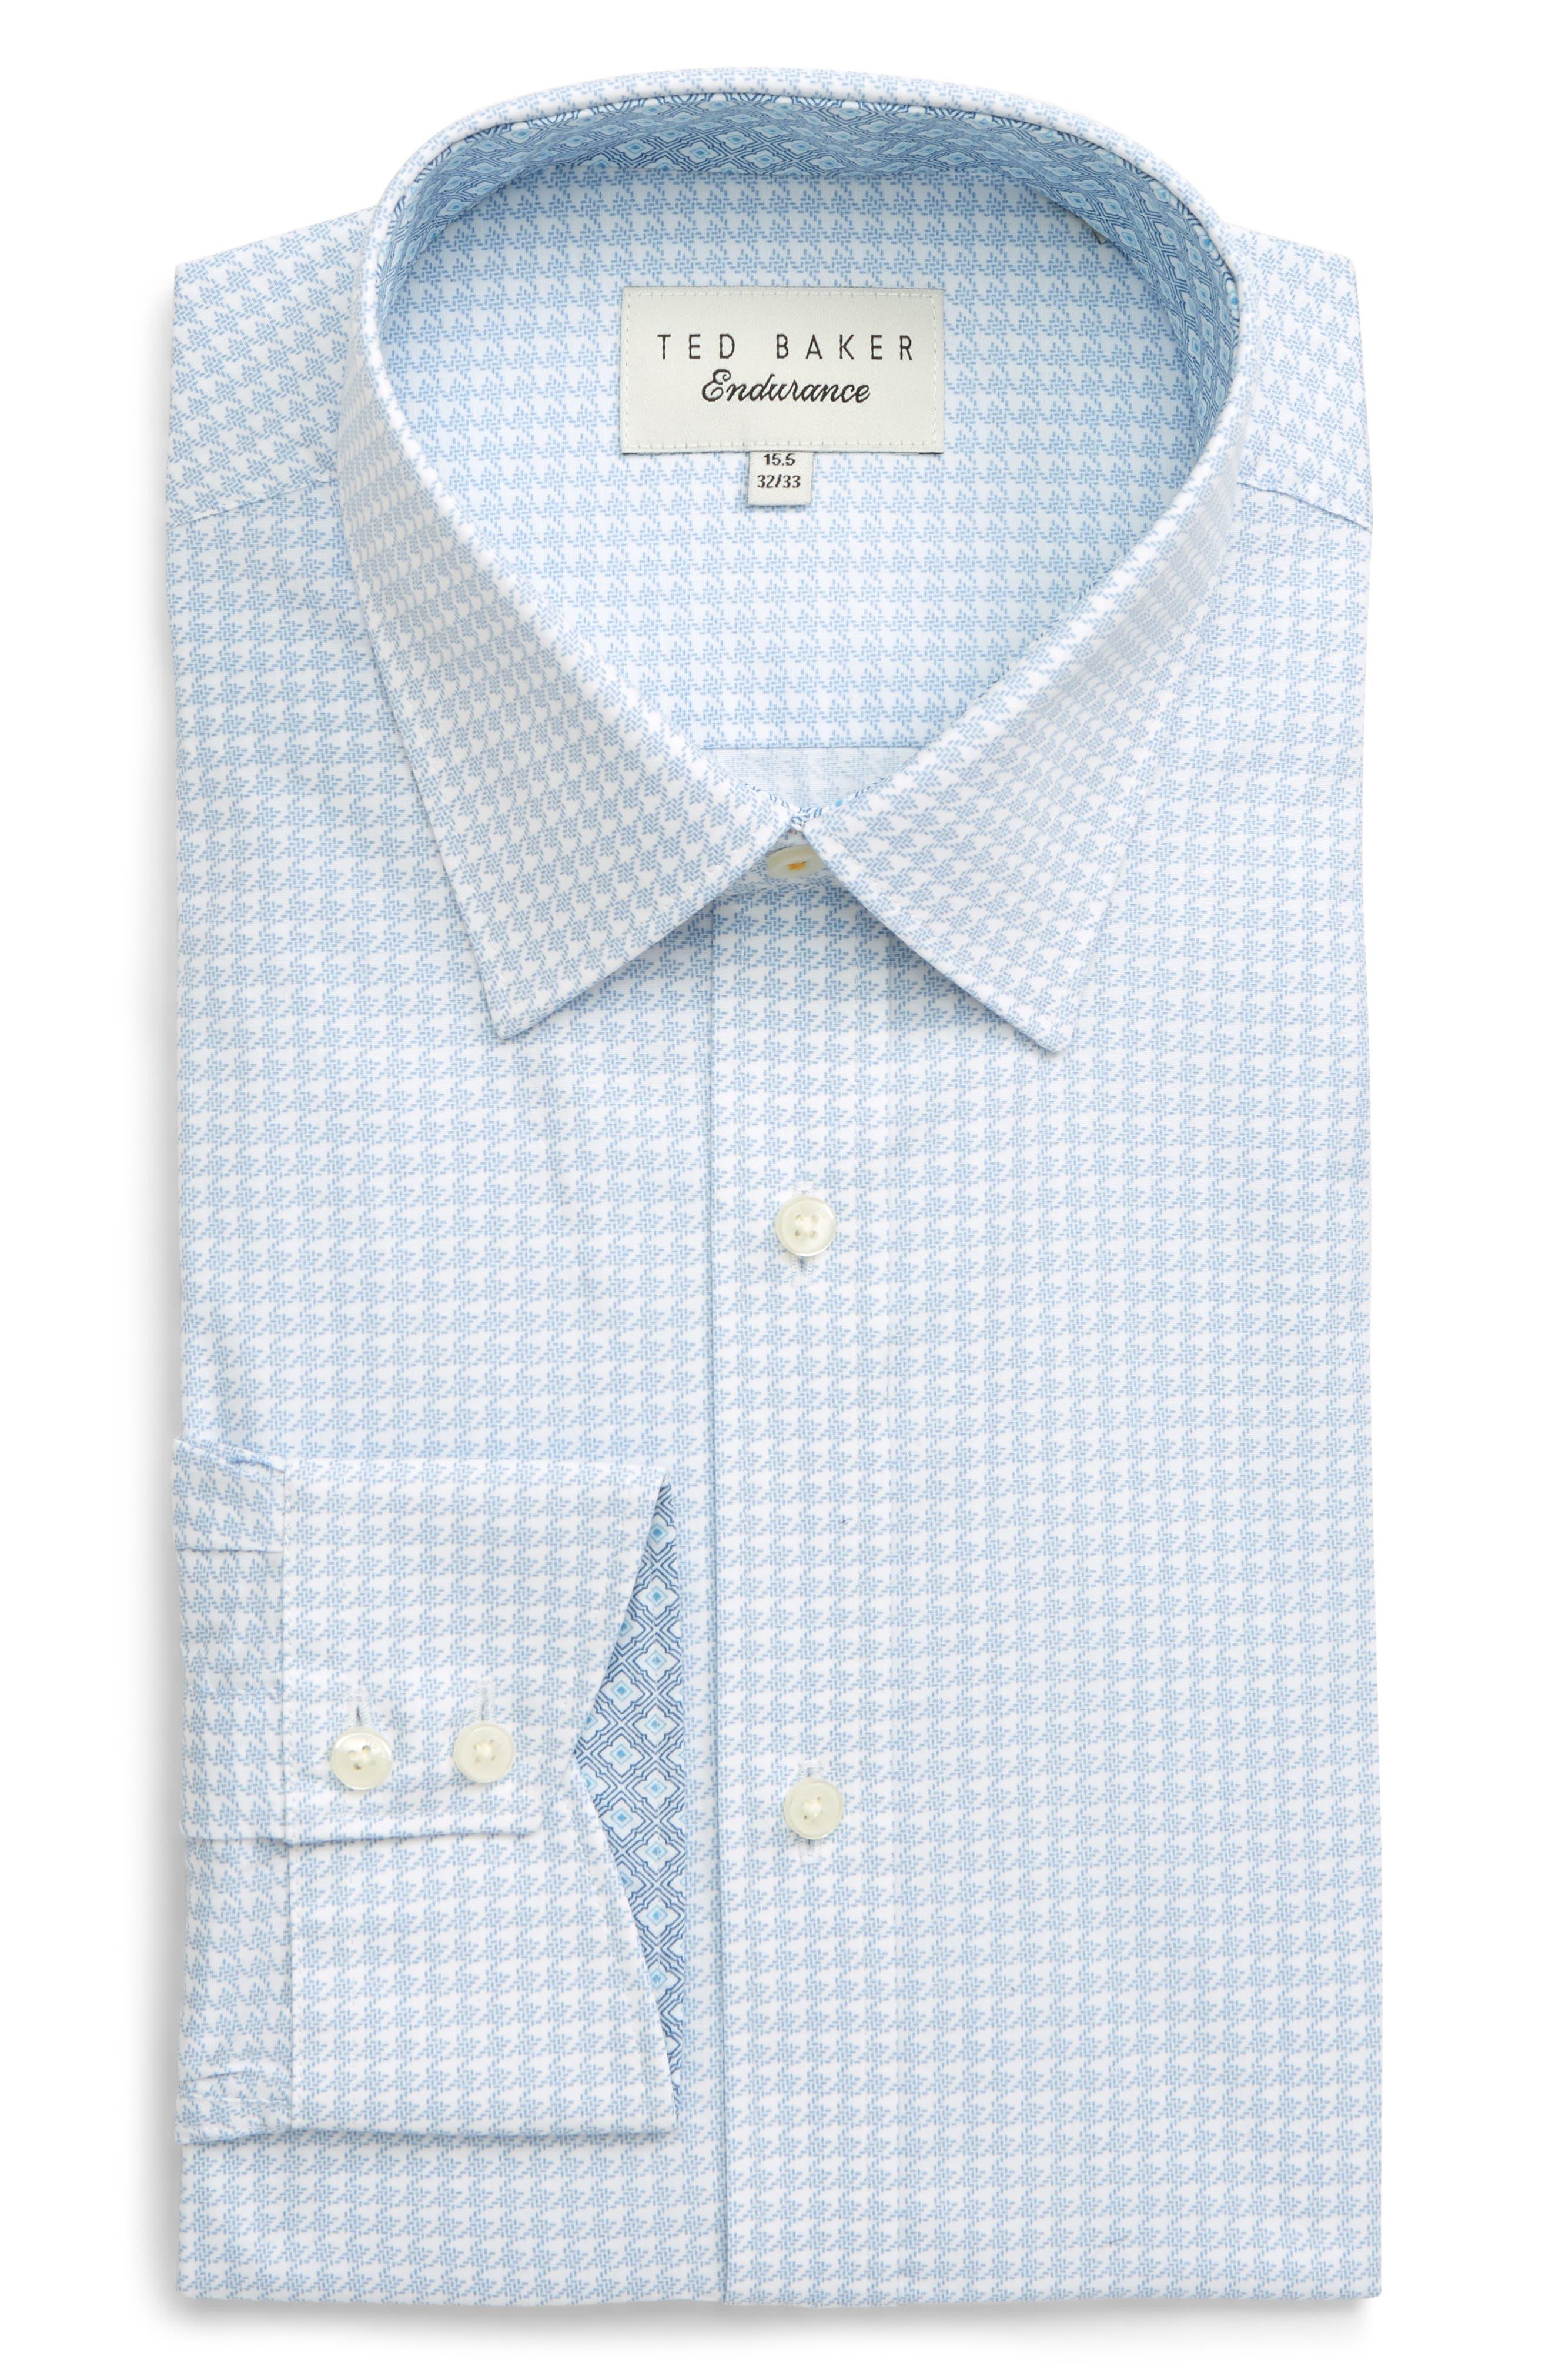 TED BAKER LONDON, Endurance Grahite Slim Fit Houndstooth Dress Shirt, Main thumbnail 1, color, BLUE